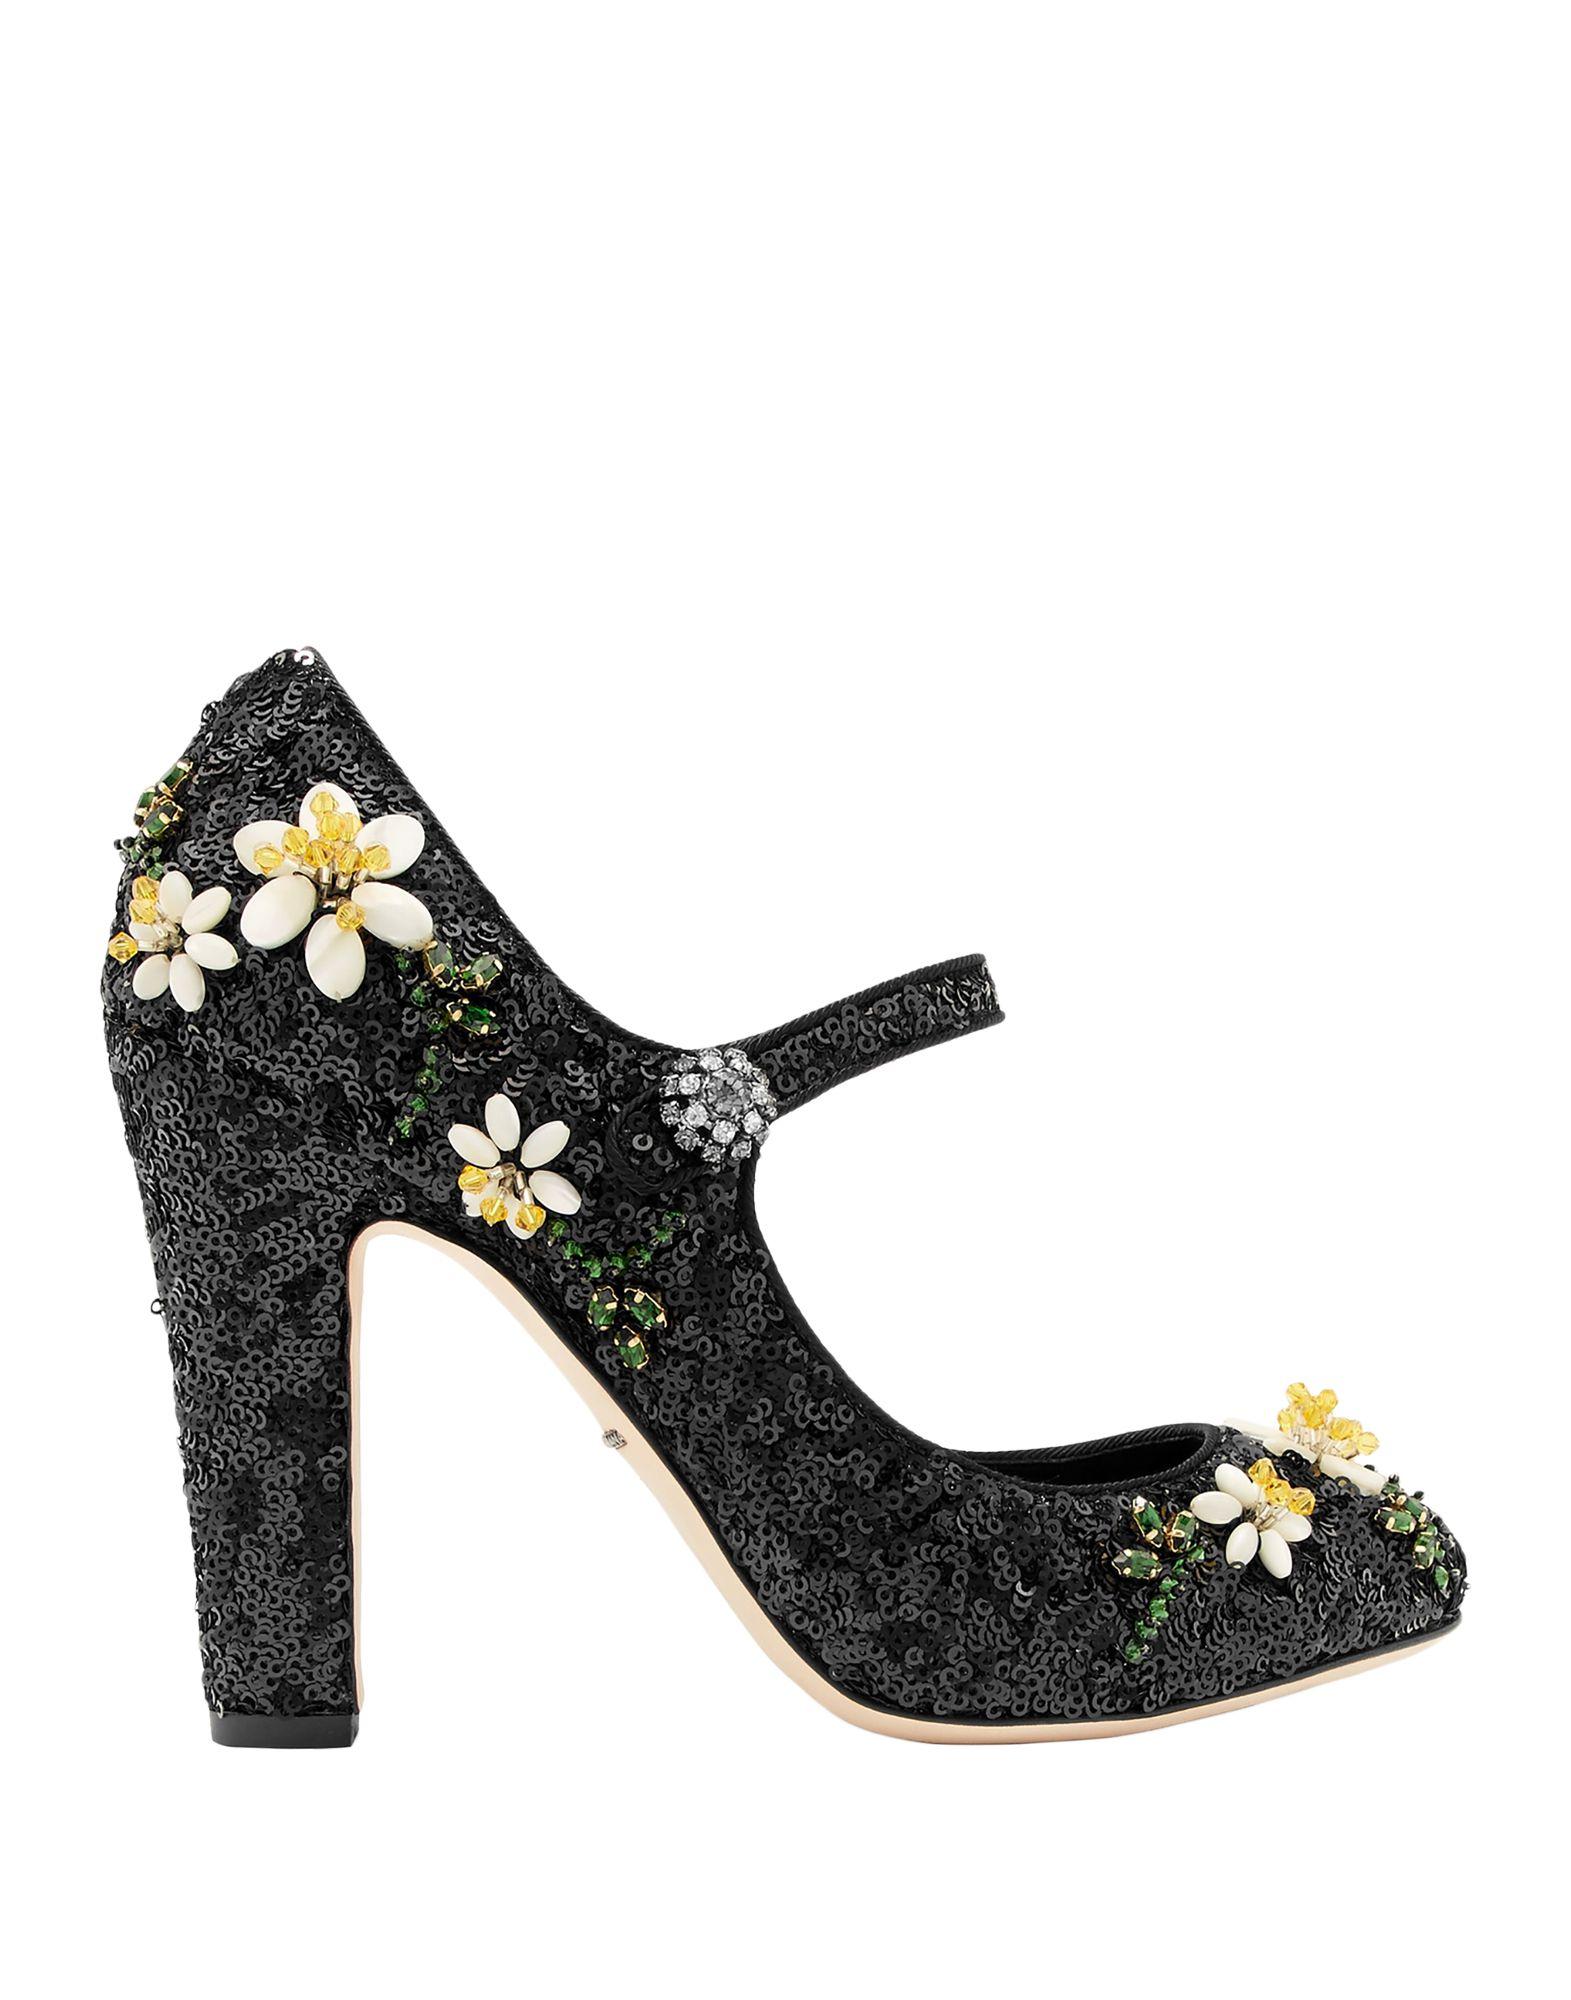 Dolce & Gabbana Pump - Women Dolce & Gabbana Australia Pumps online on  Australia Gabbana - 11567261VV 745fd4